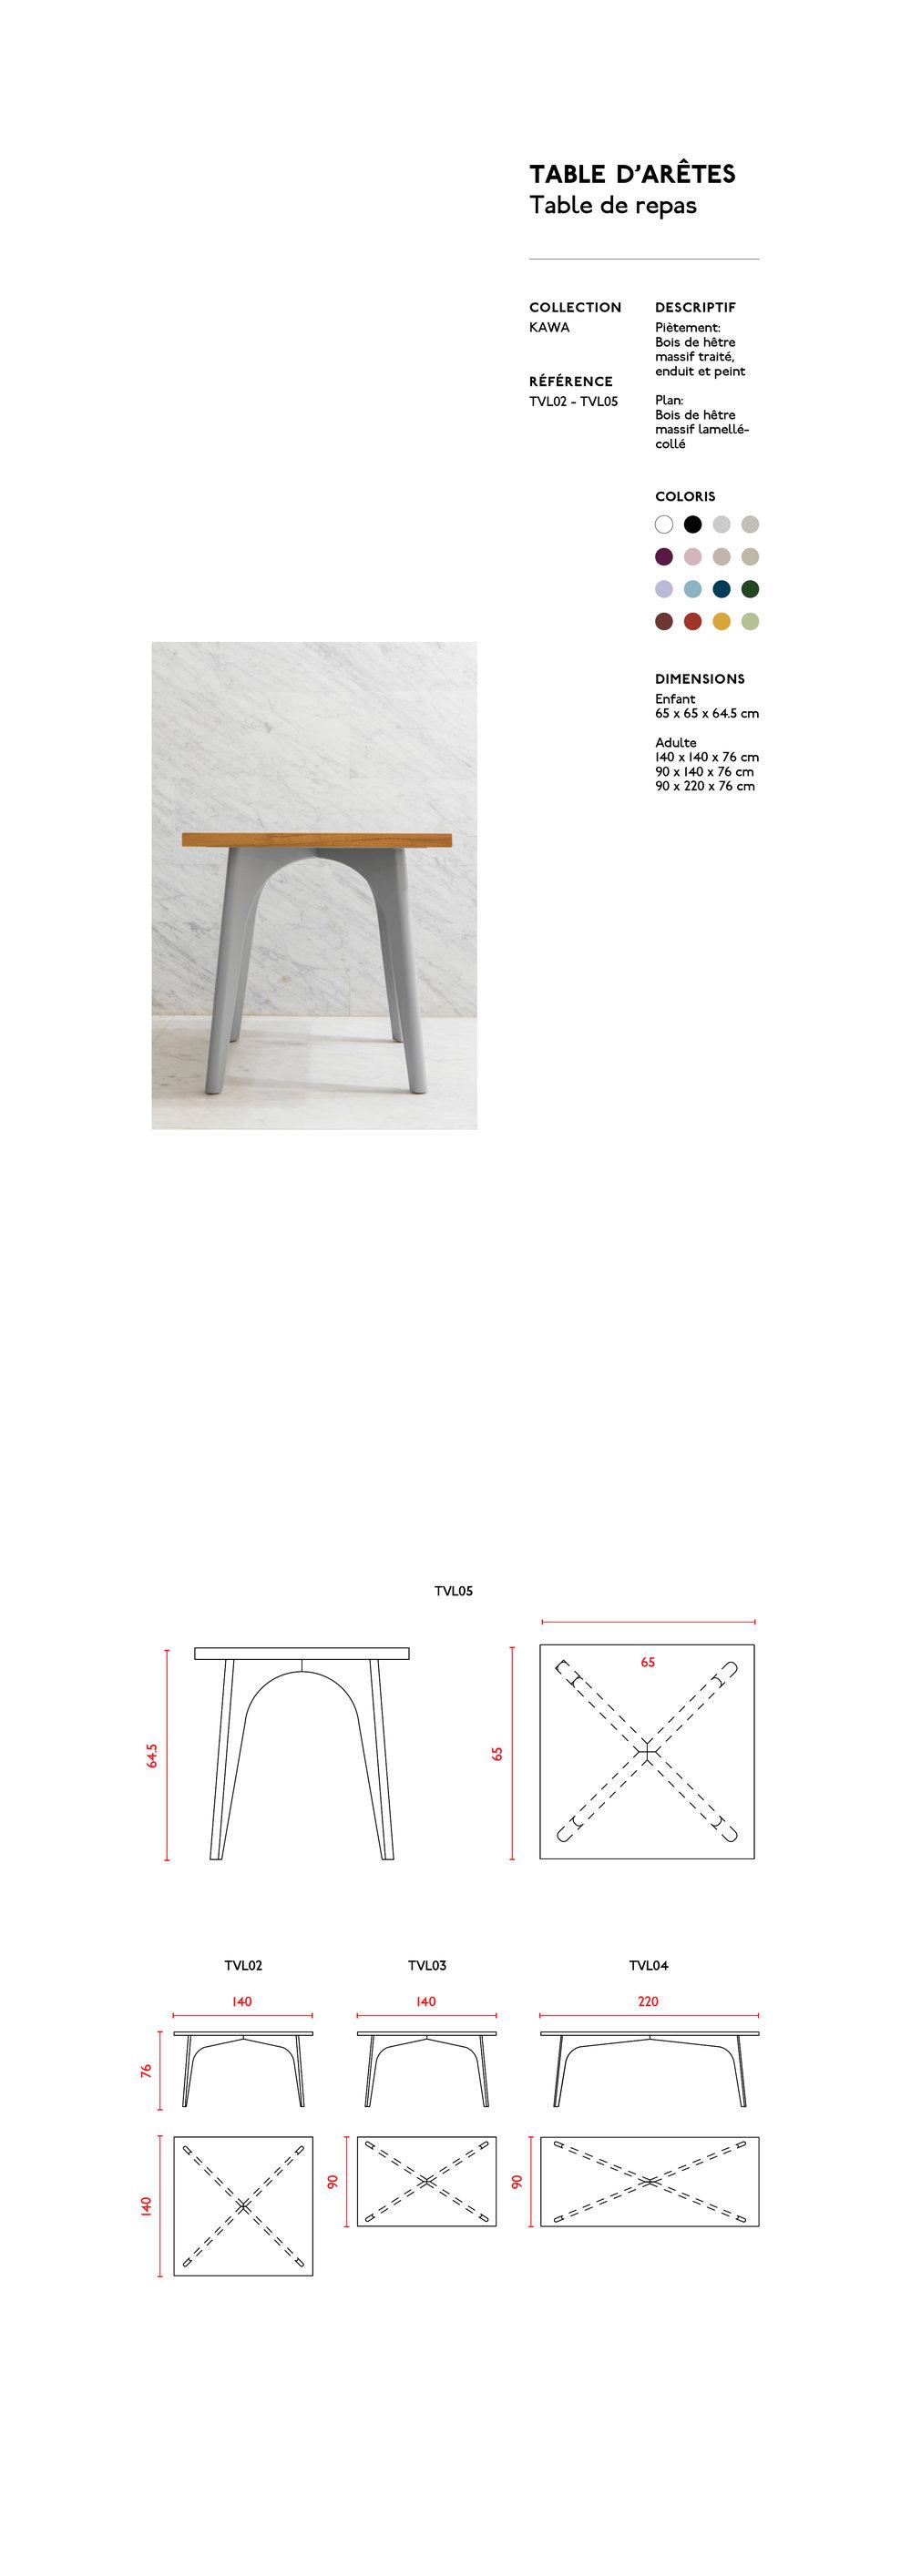 TABLE DARETE.jpg